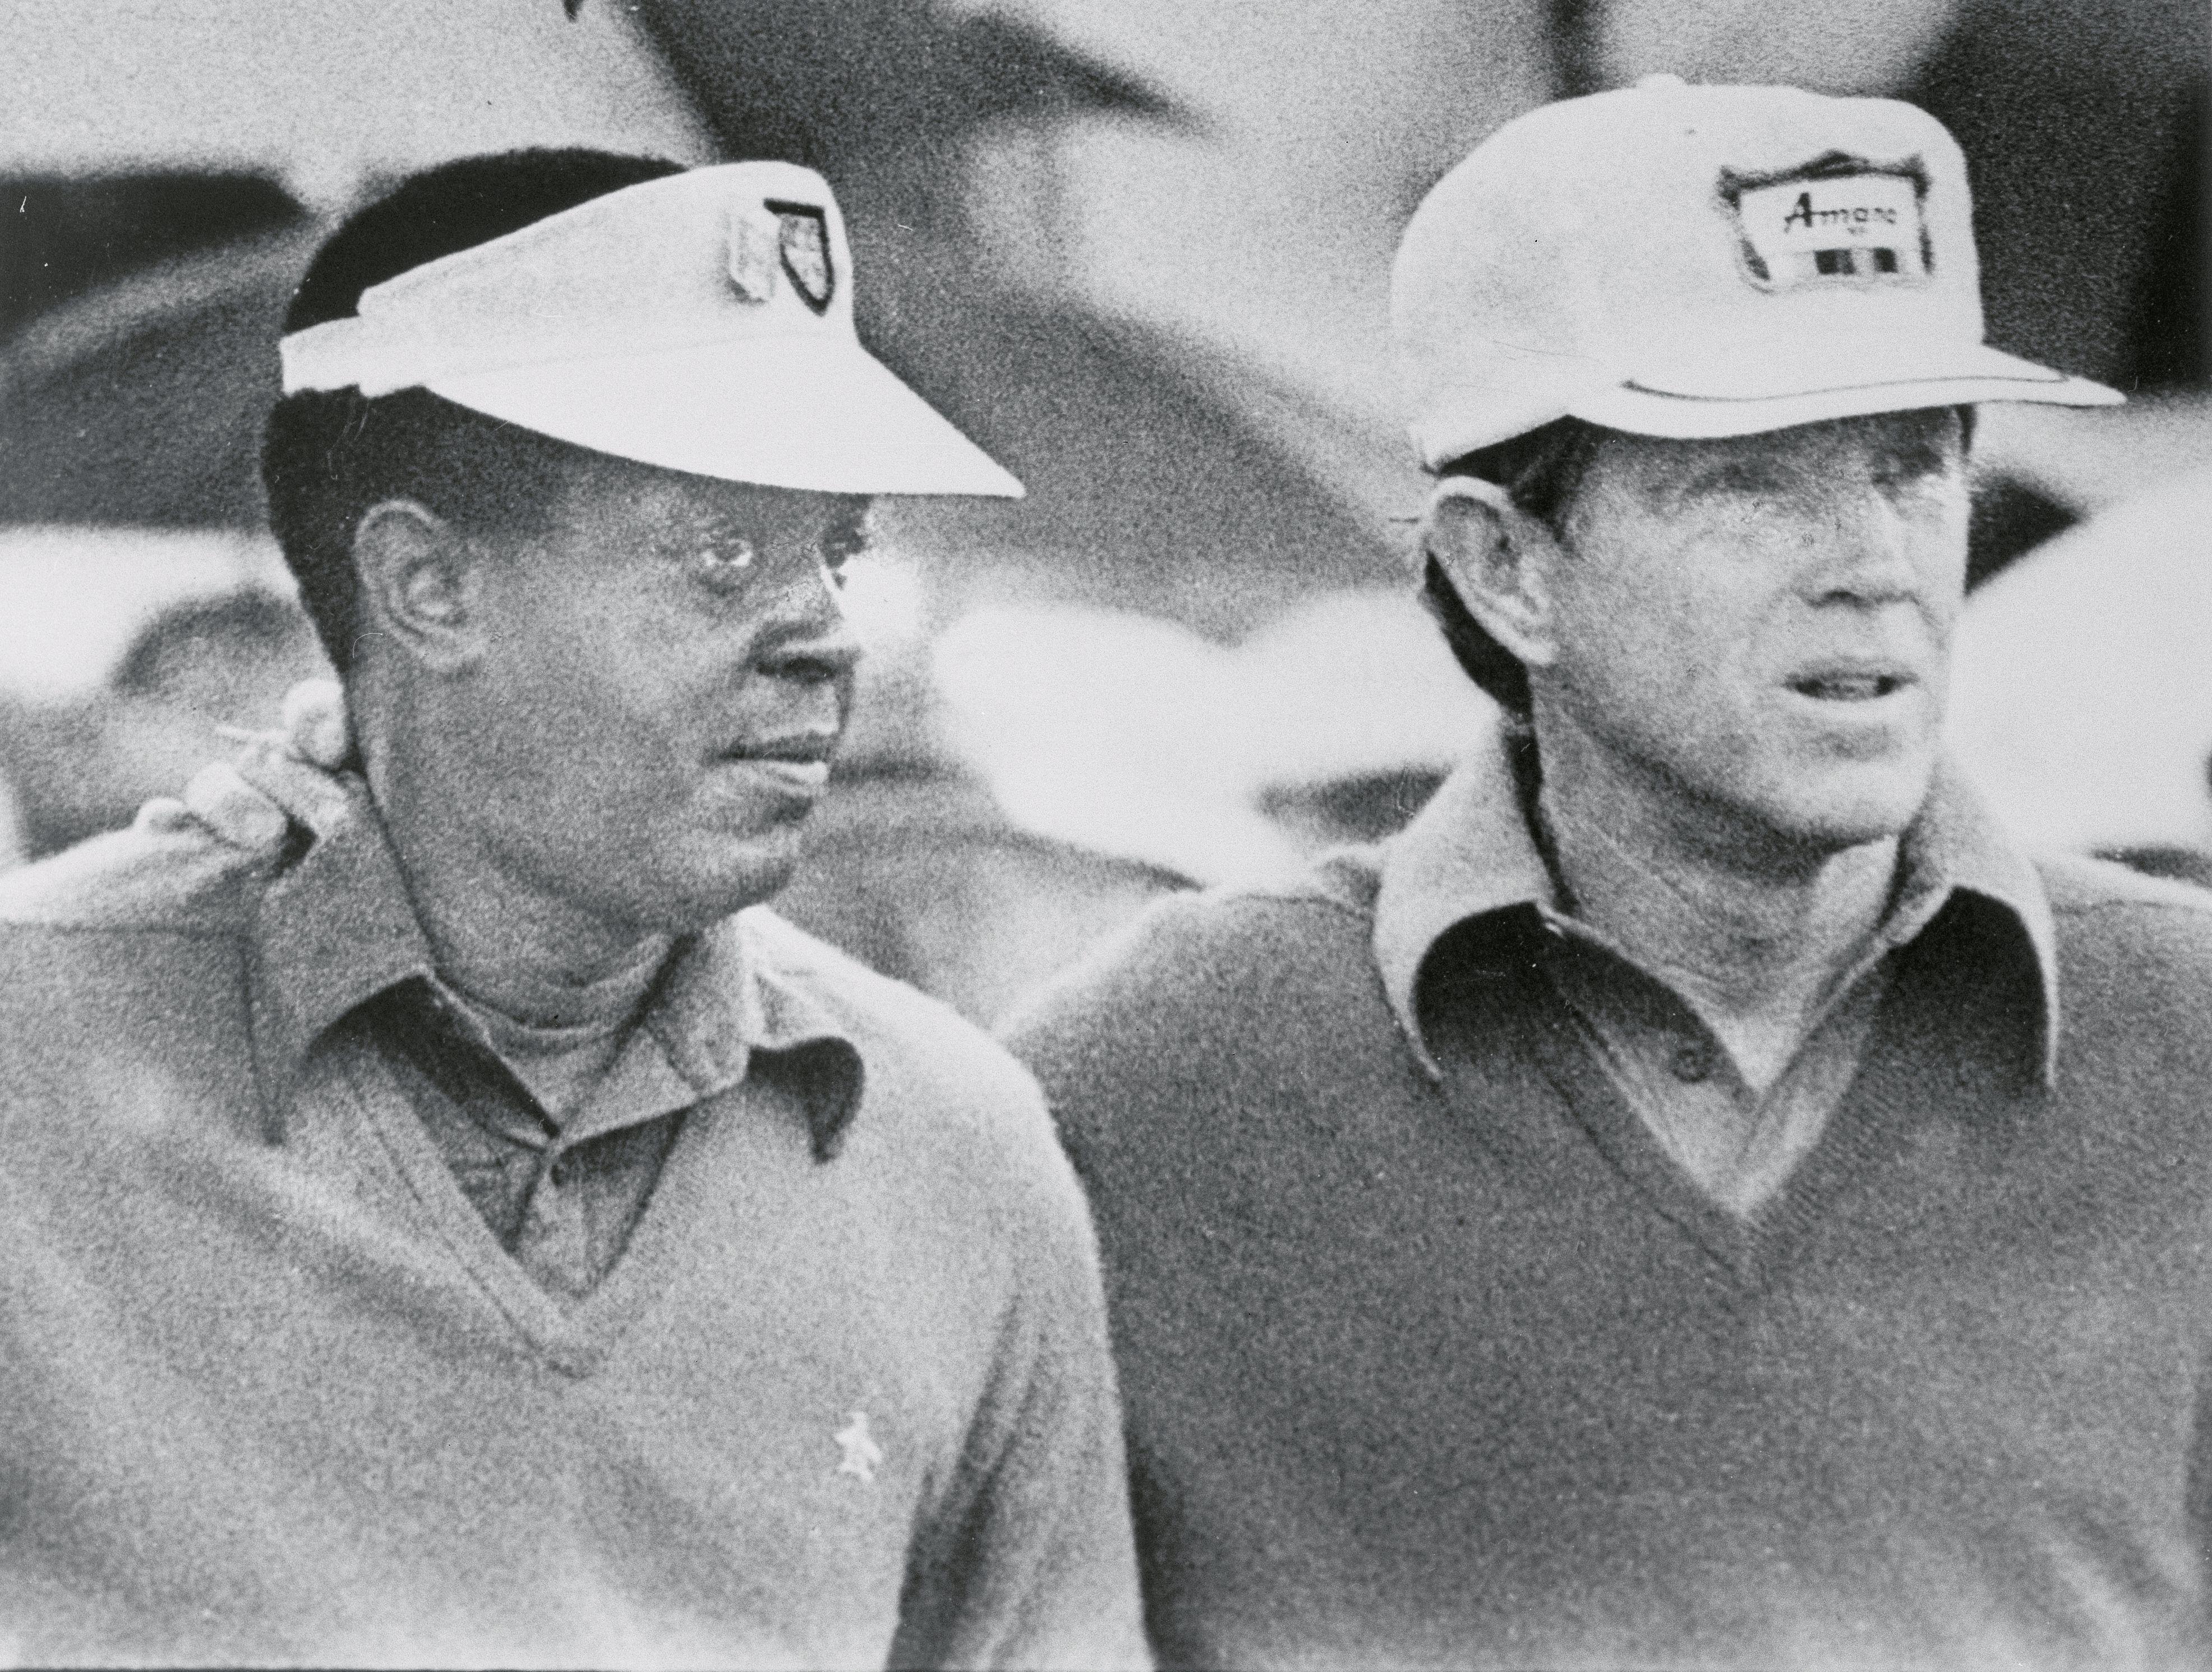 Lee Elder and Gene Littler prepare to tee off in the 1975 Masters